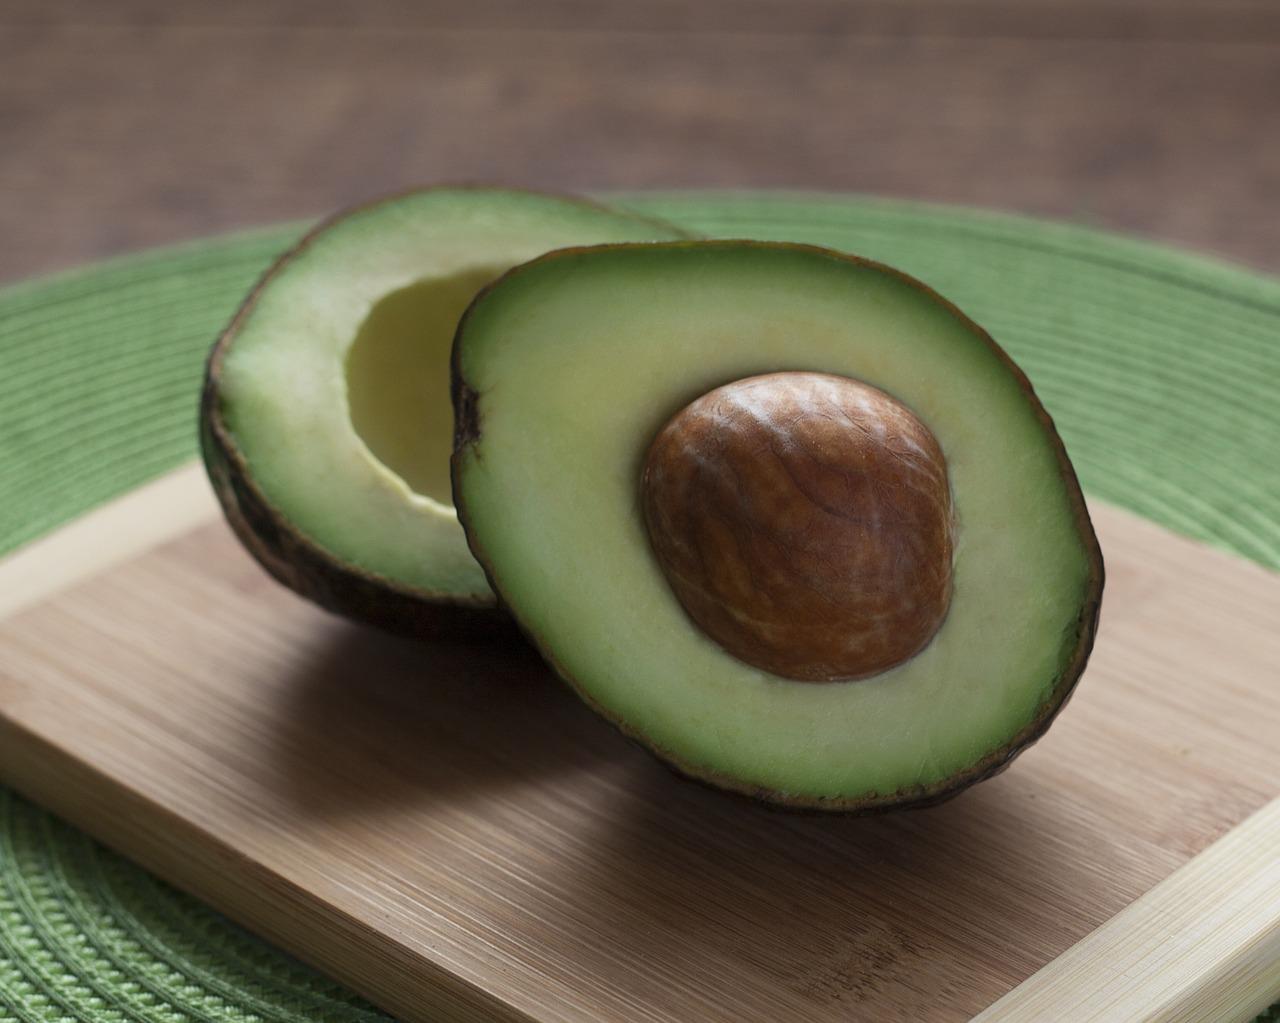 Weekly Economic News Roundup and avocado consunption